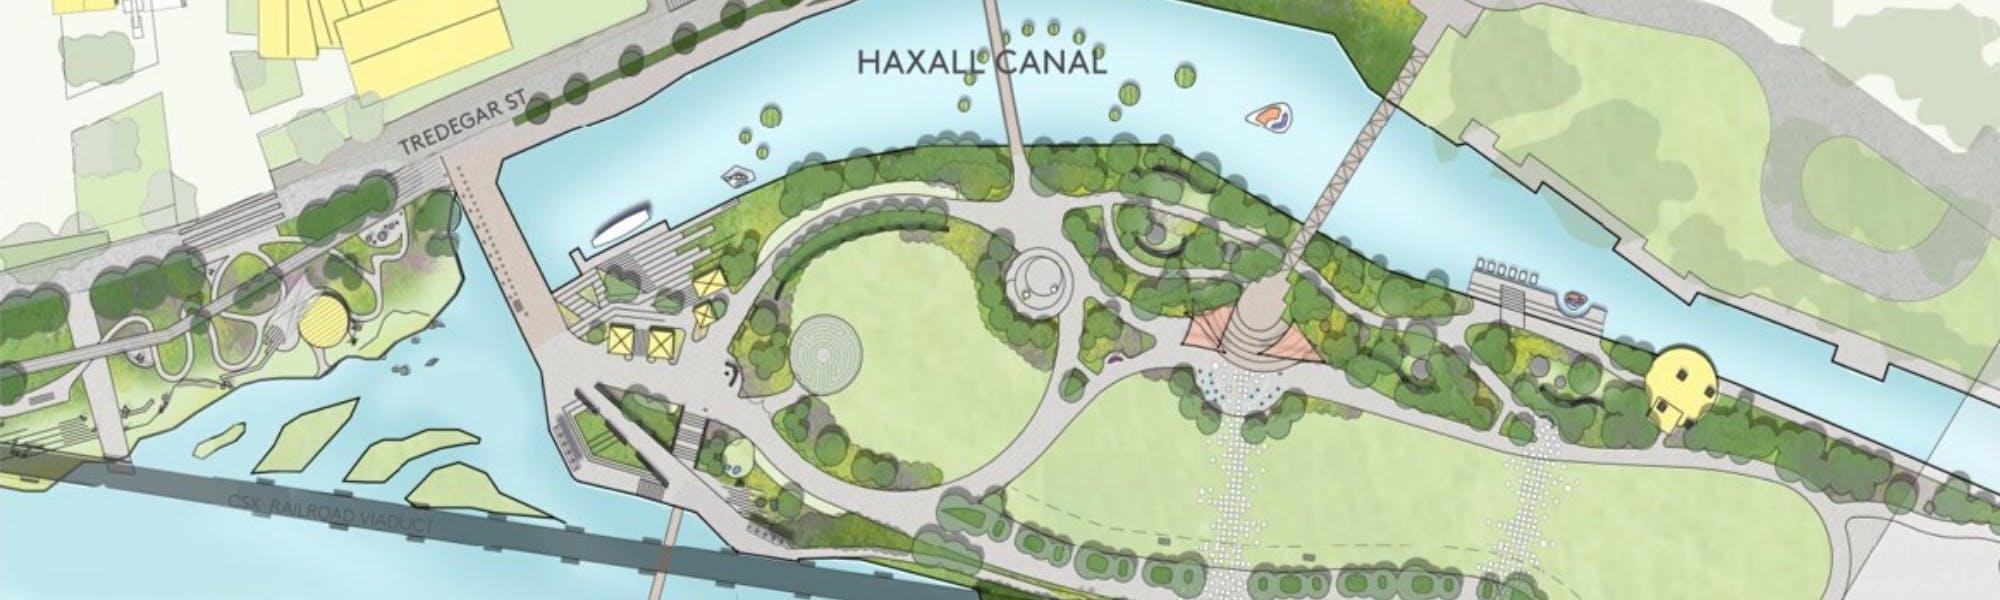 Brown's Island Improvement Plan